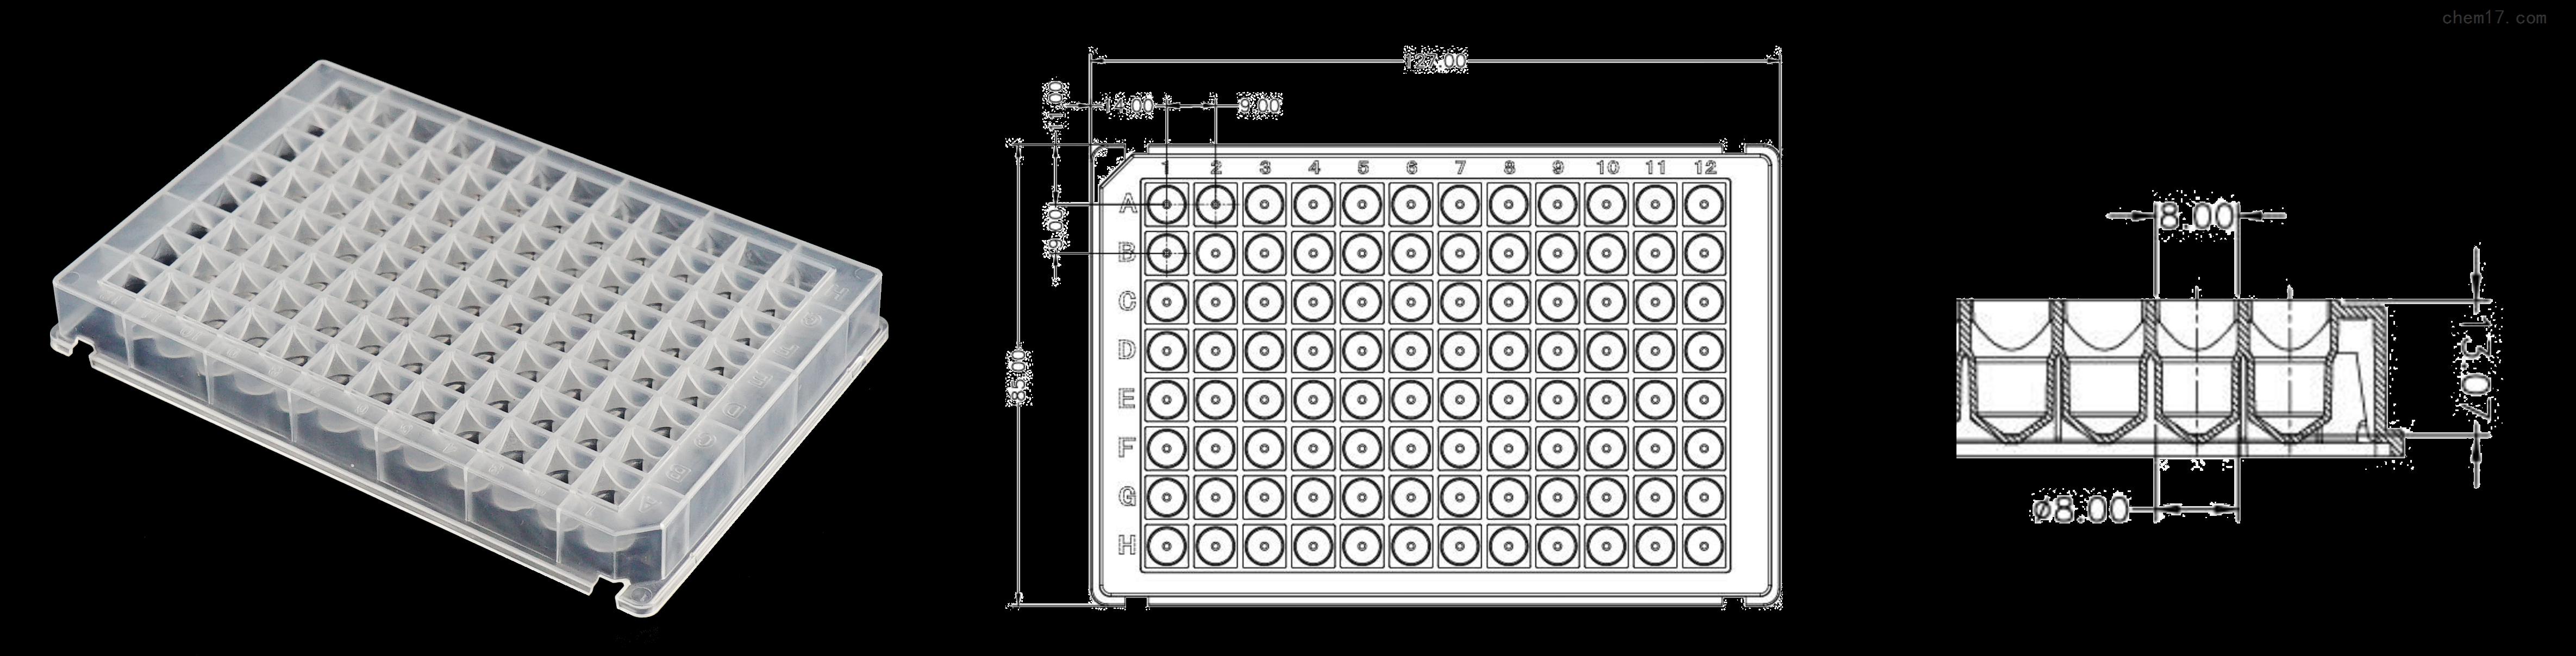 Elution Plate 3 Schematics_porvair.png